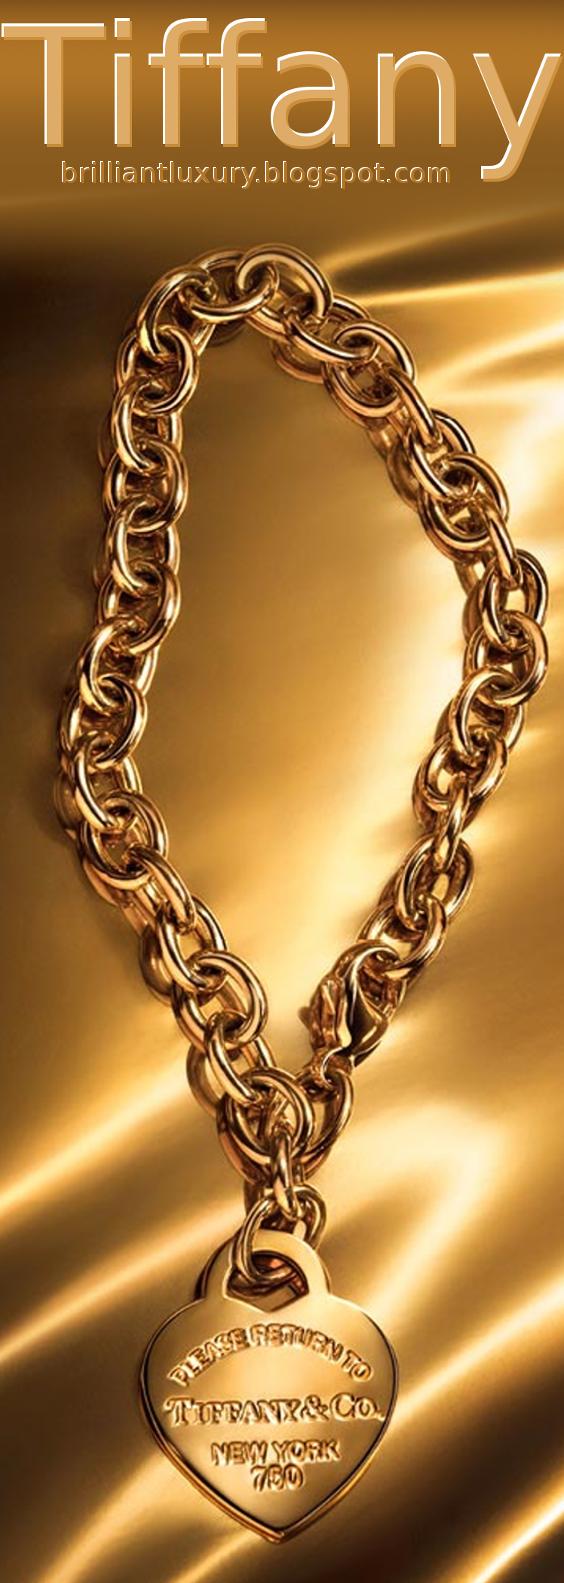 Brilliant Luxury ♦ Tiffany heart tag bracelet